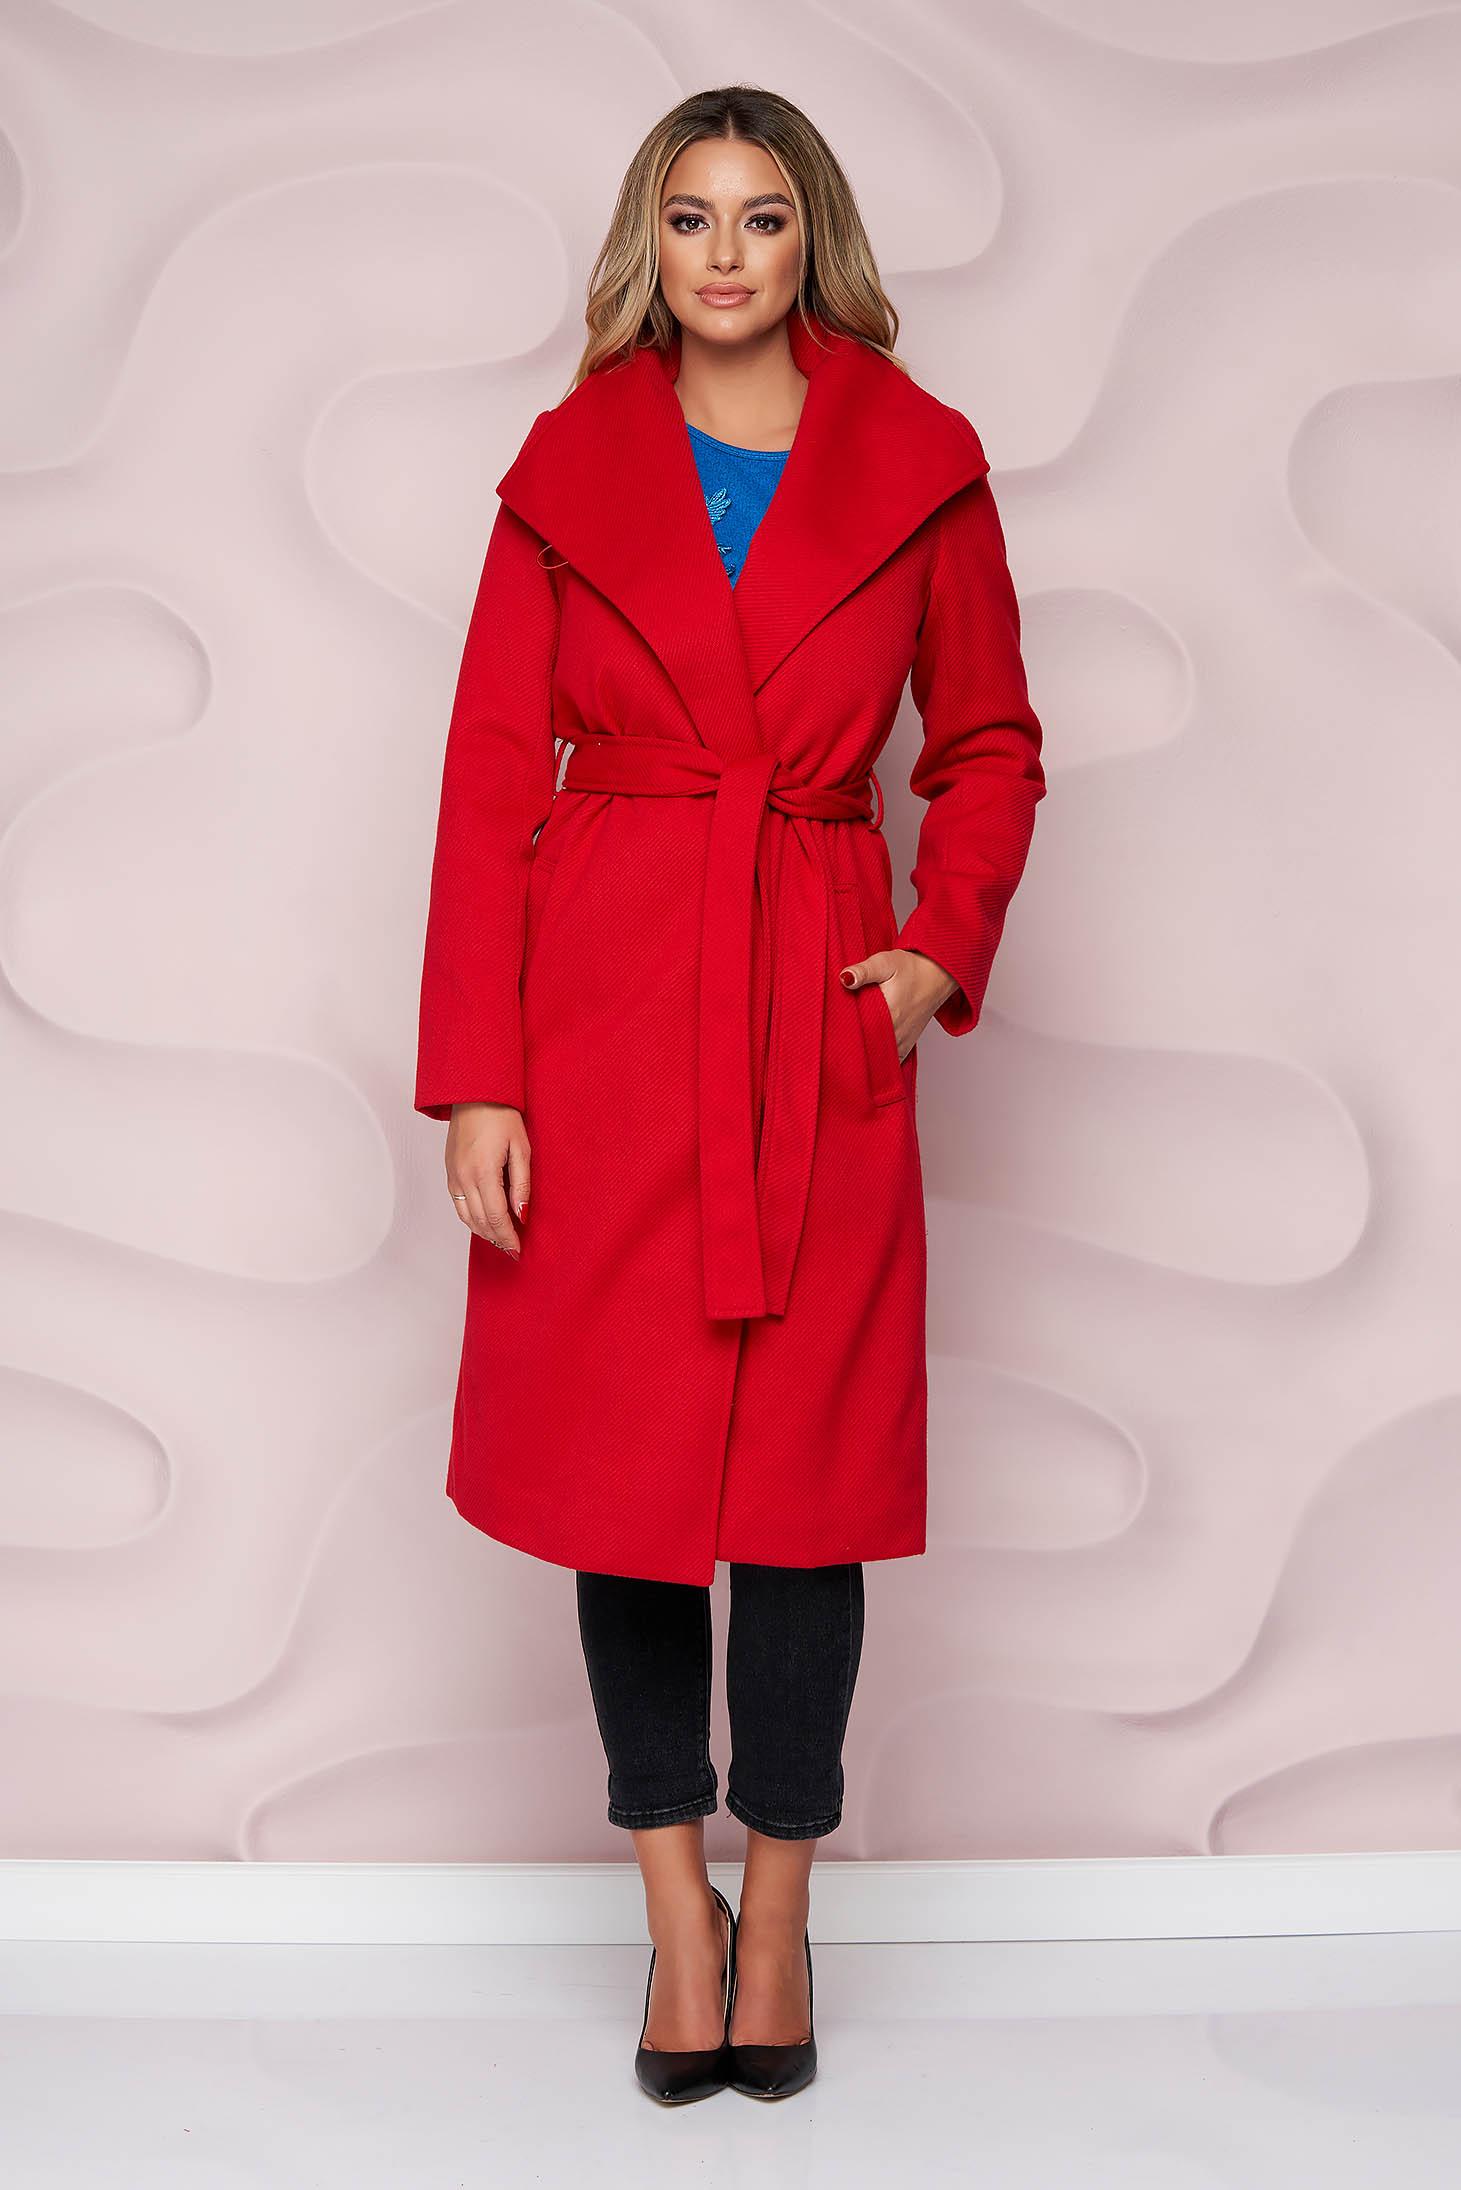 Palton SunShine rosu imblanit cu un croi drept din material gros si cordon detasabil